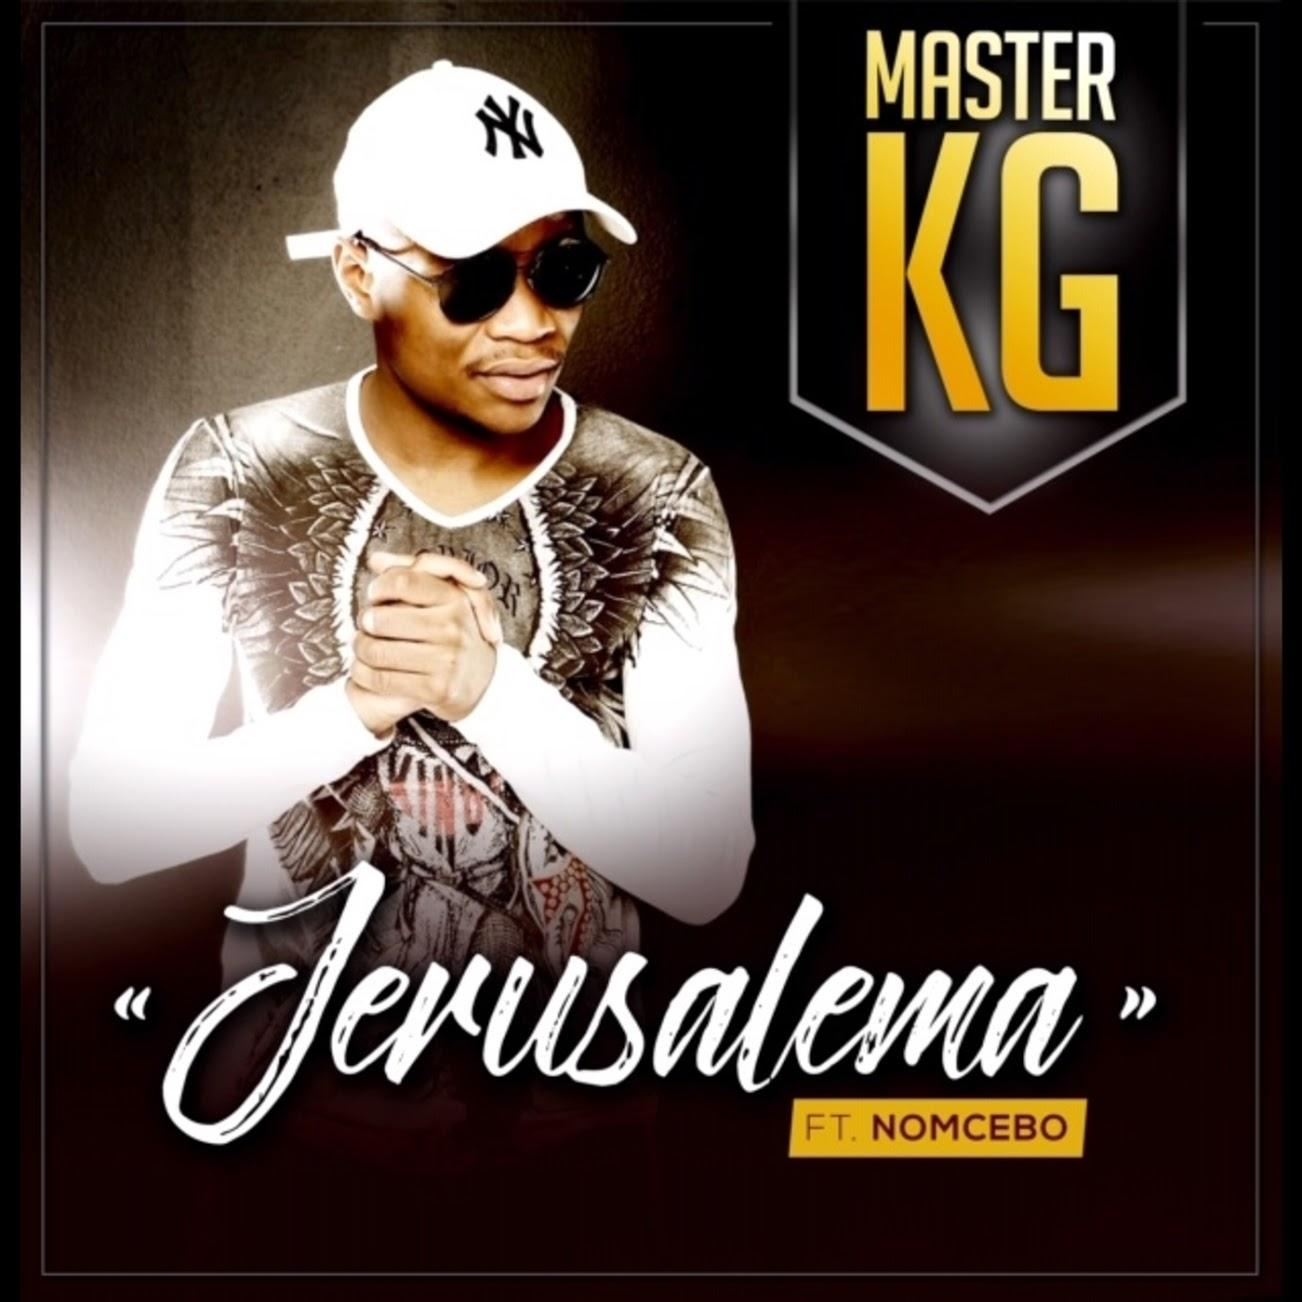 MASTER KG - Lyrics, Playlists & Videos | Shazam